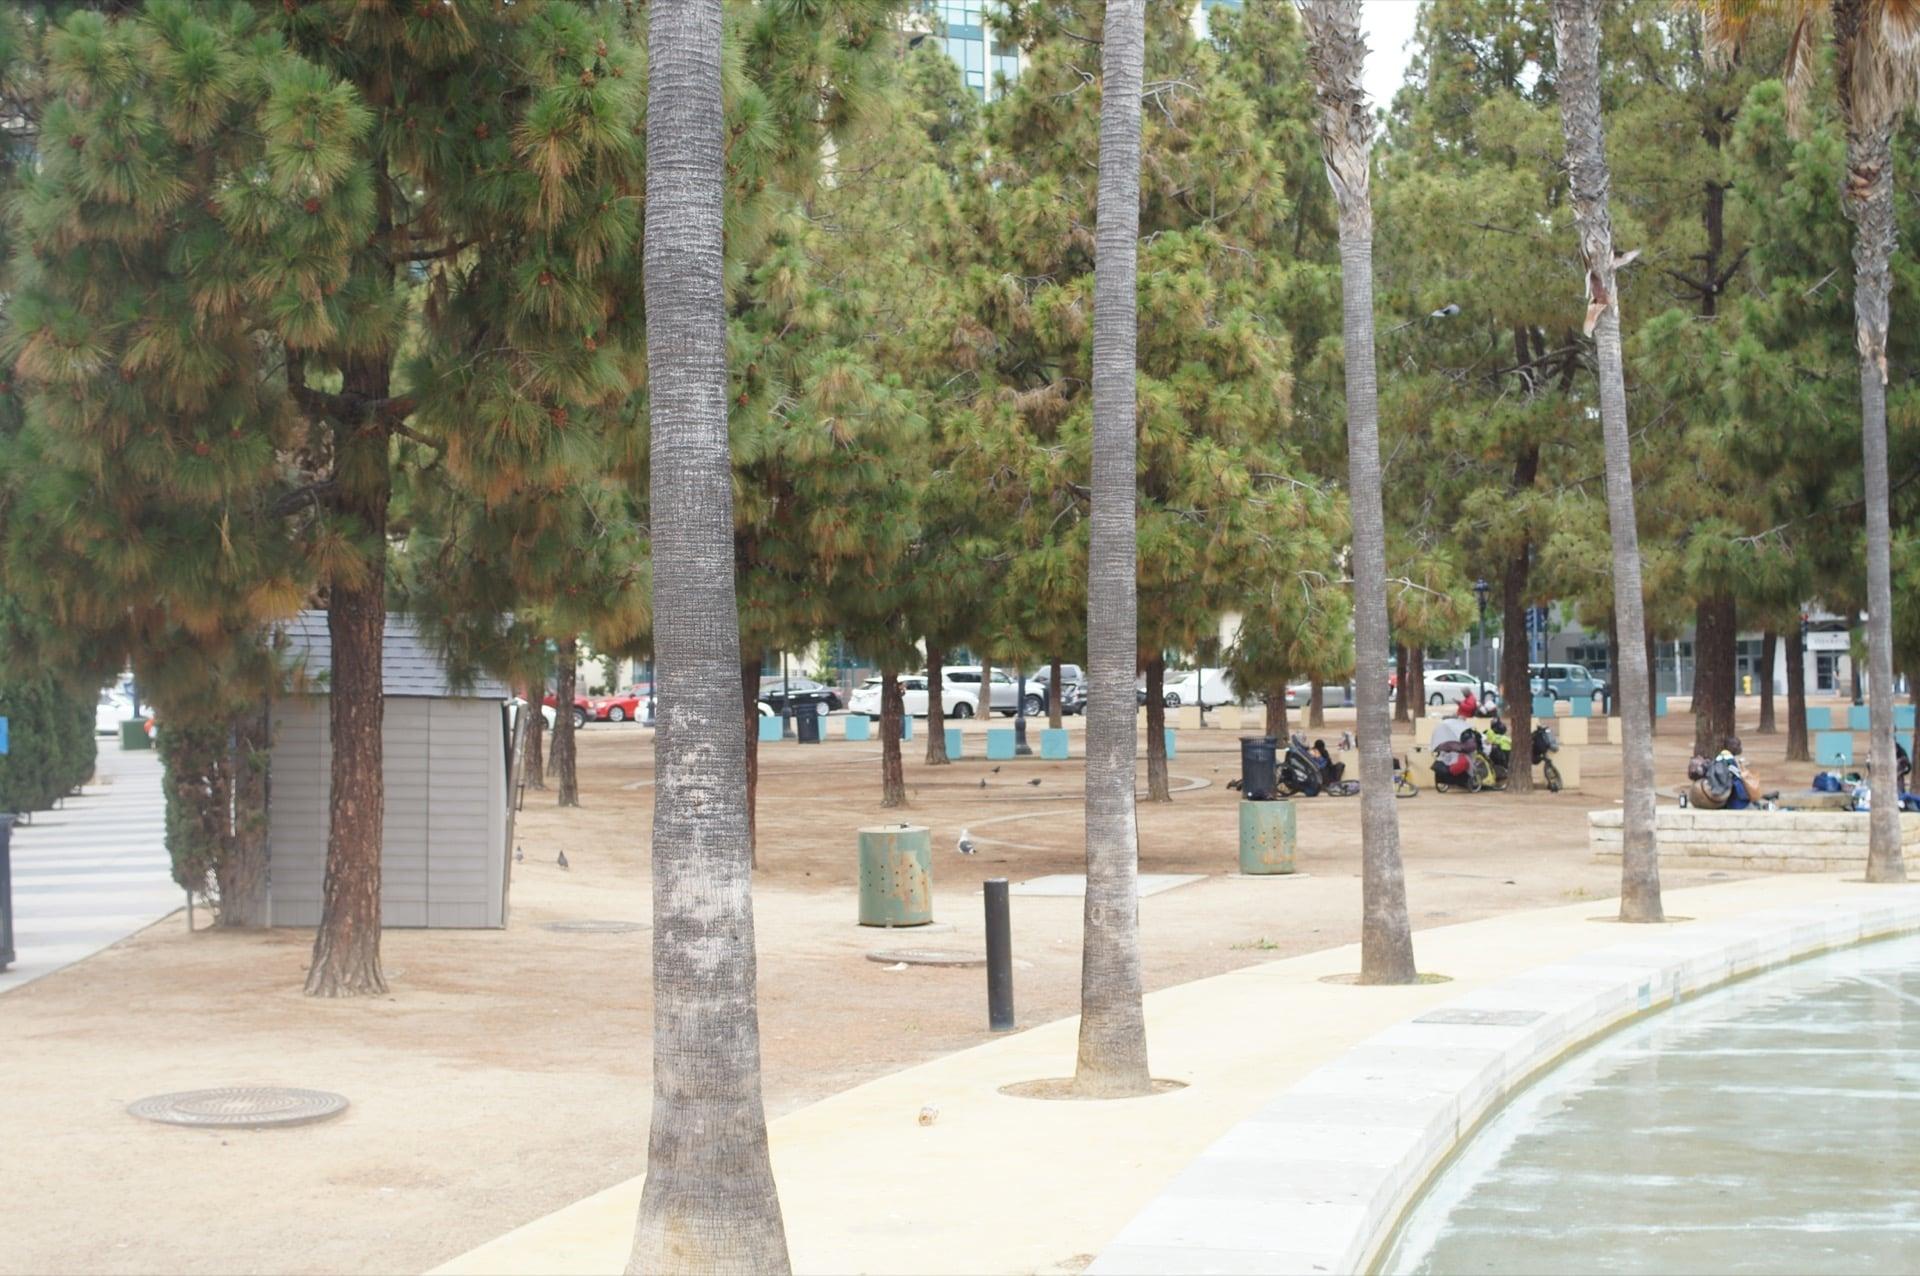 City of San Diego Paid Millions on Sidewalk Injuries in 2018